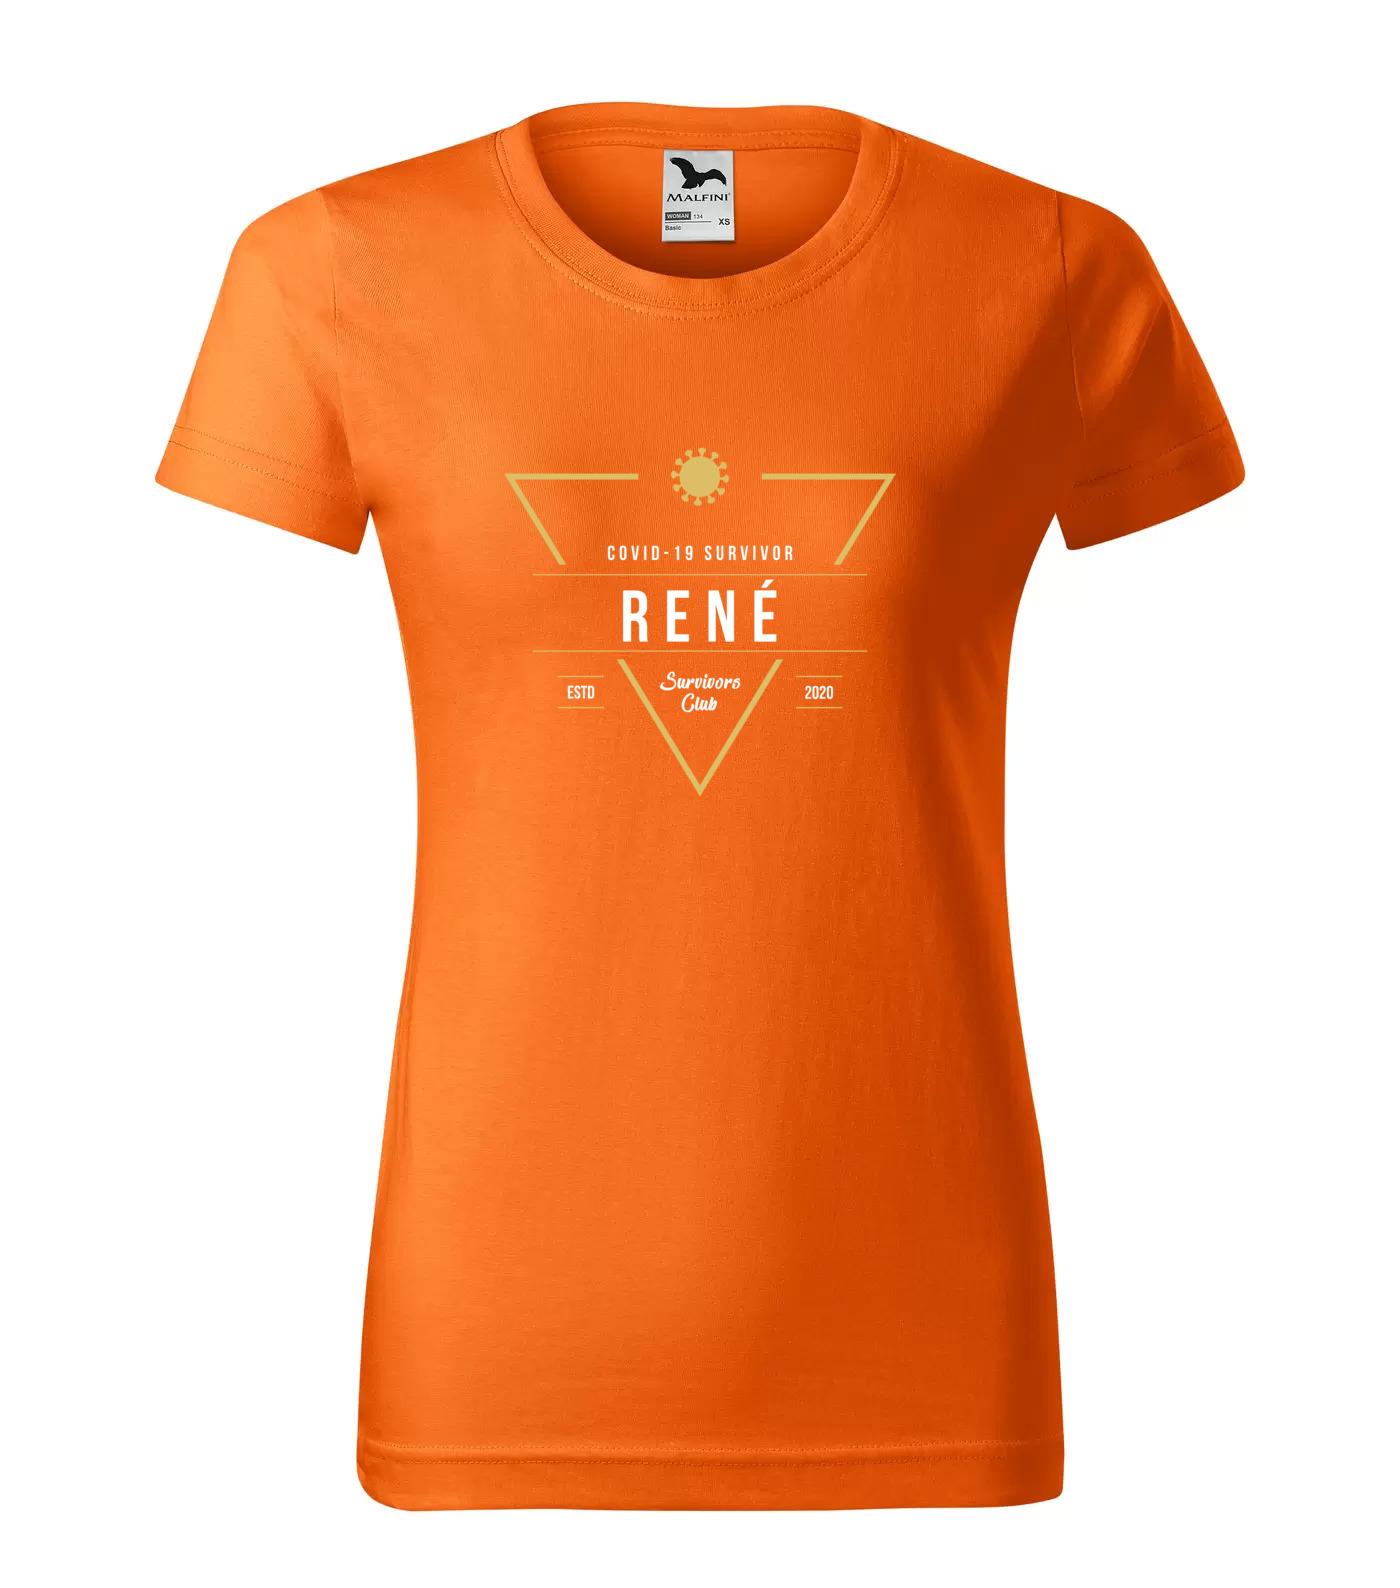 Tričko Survivor Club René